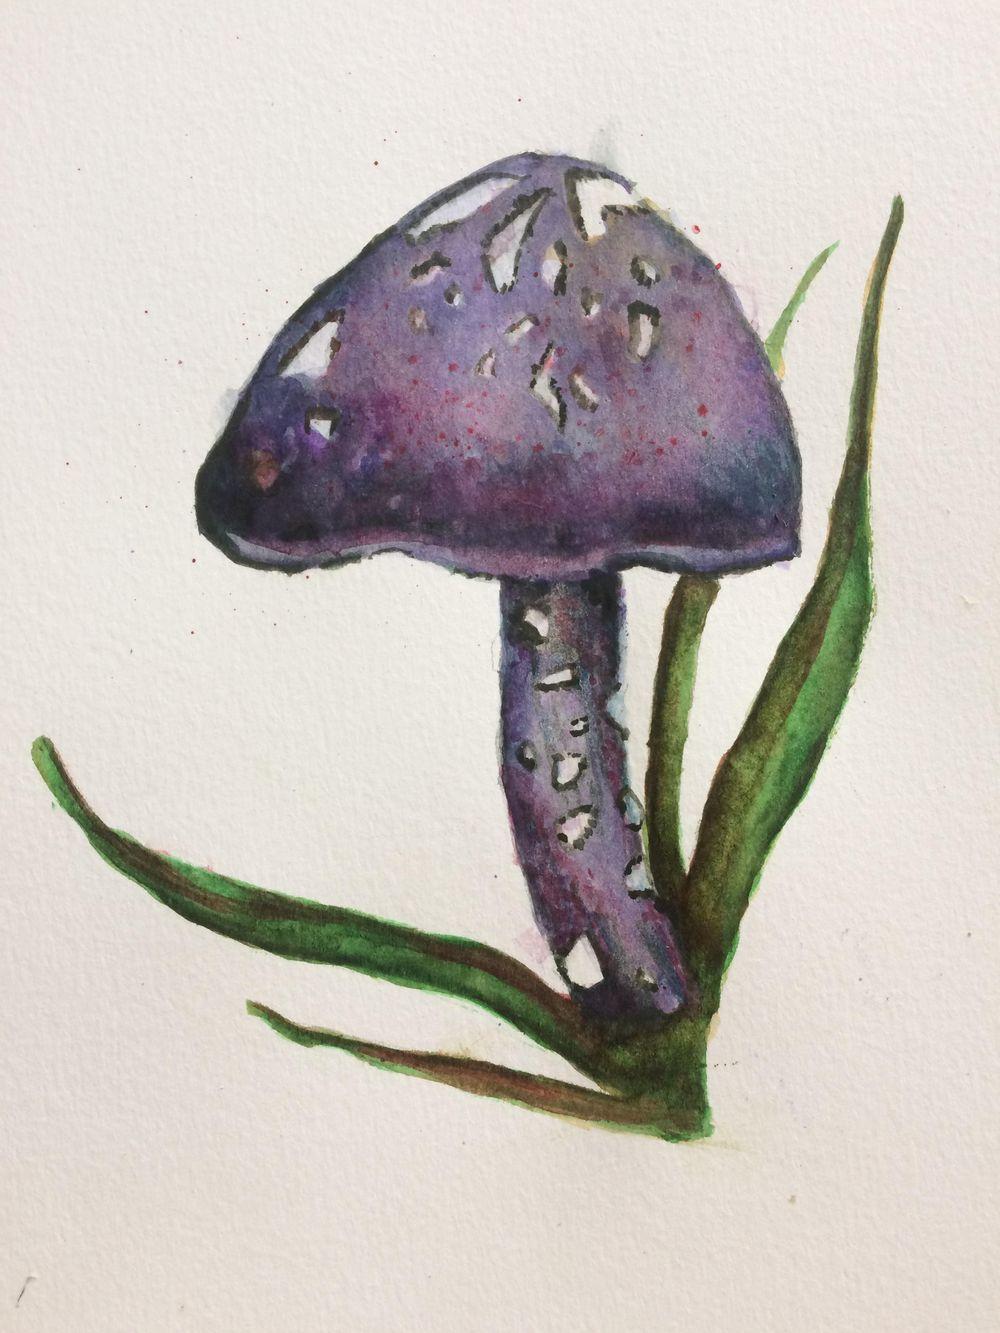 Watercolor mushroom - image 1 - student project